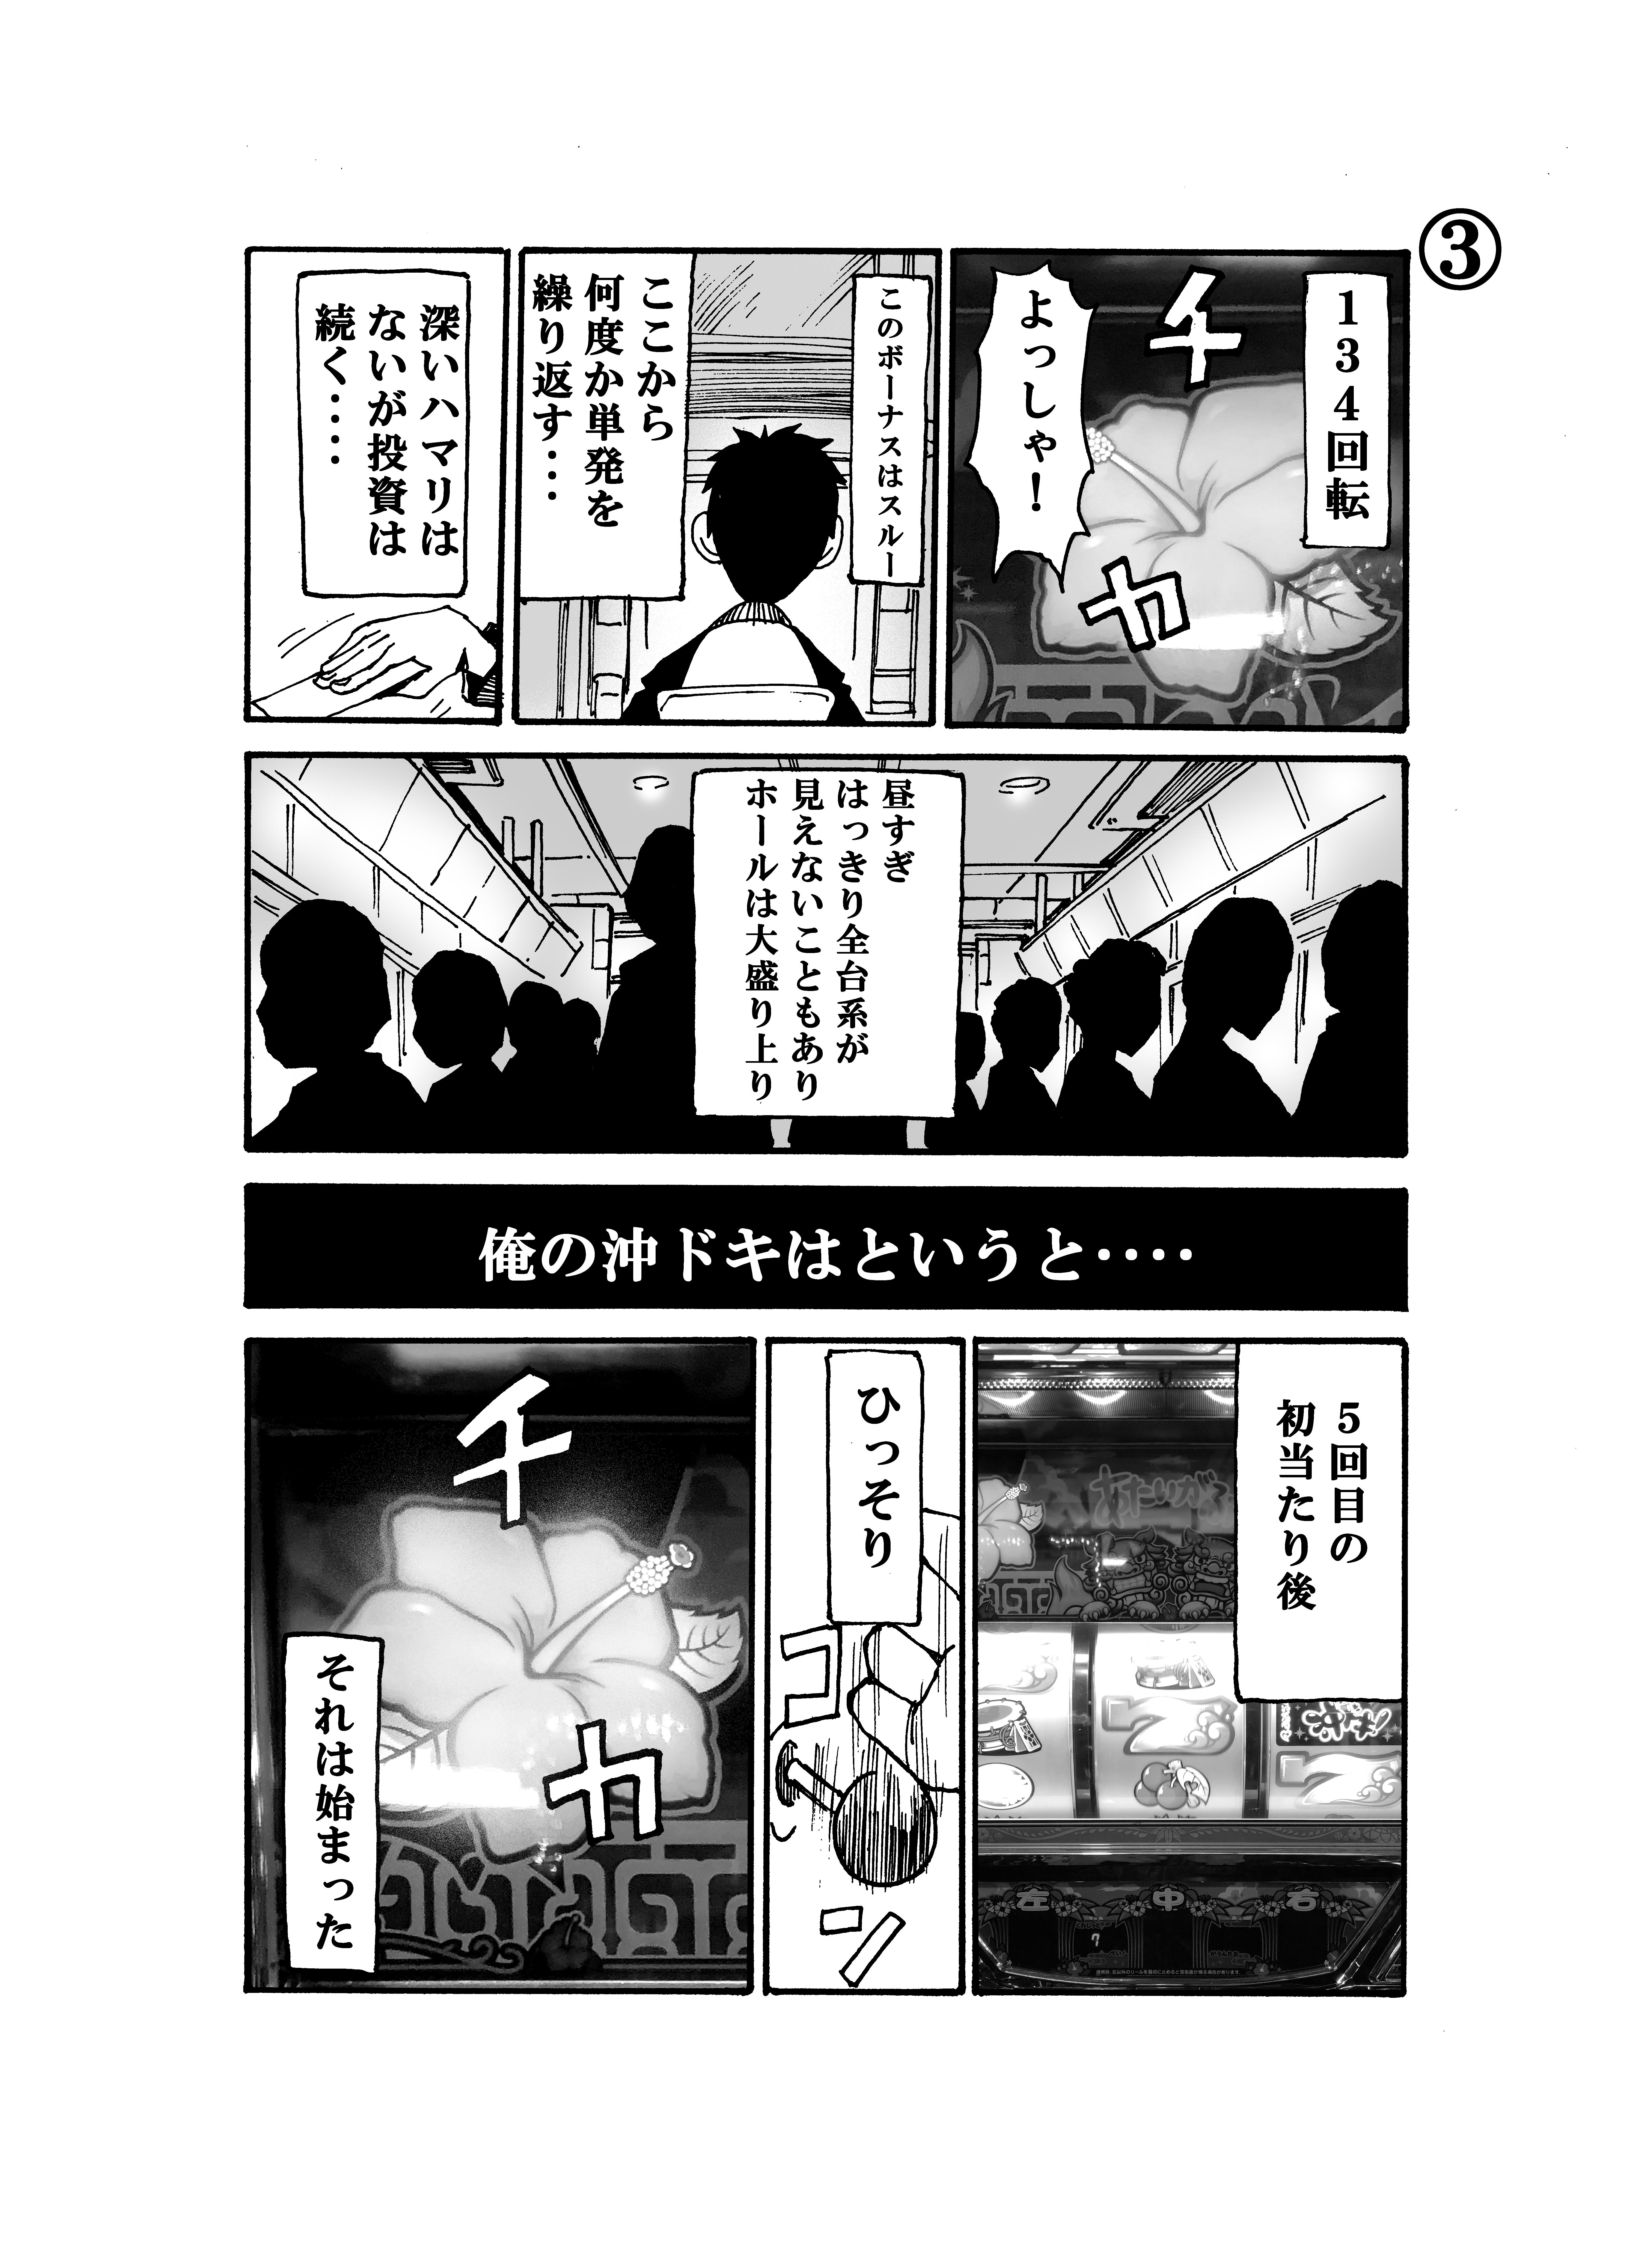 12/21③